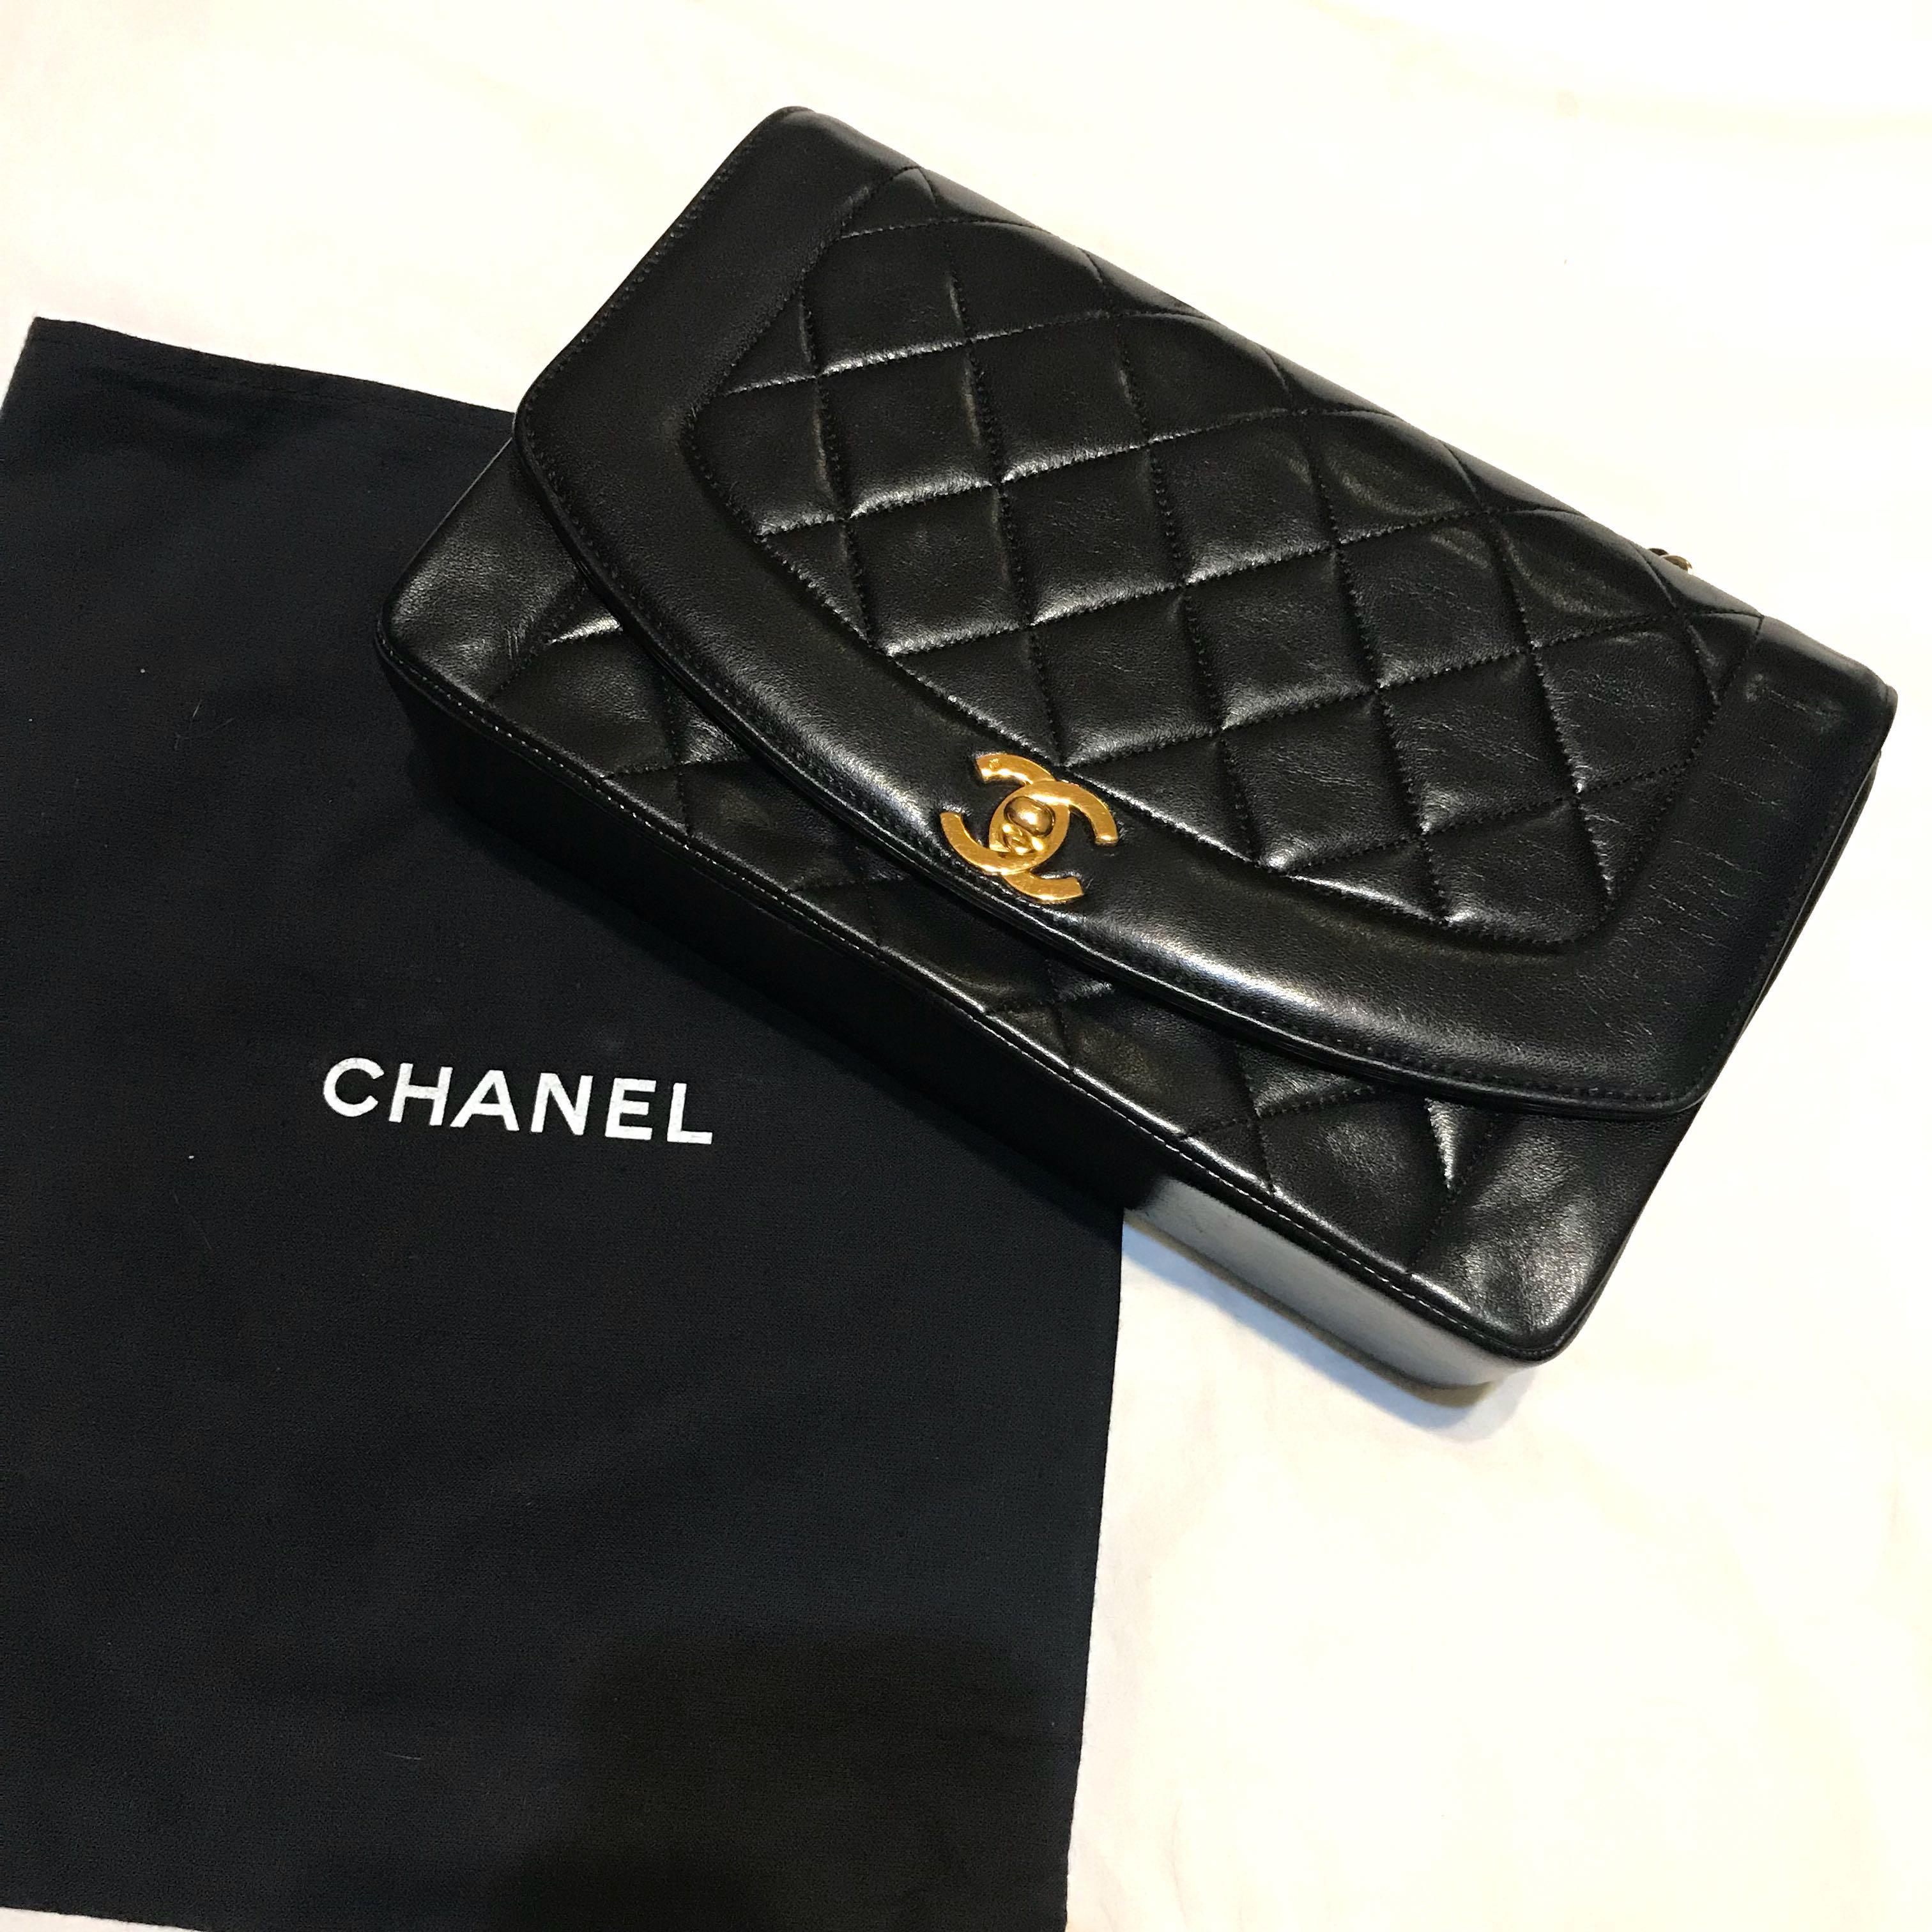 ed1013243a56 Vintage Chanel Diana Flap bag 10 inch